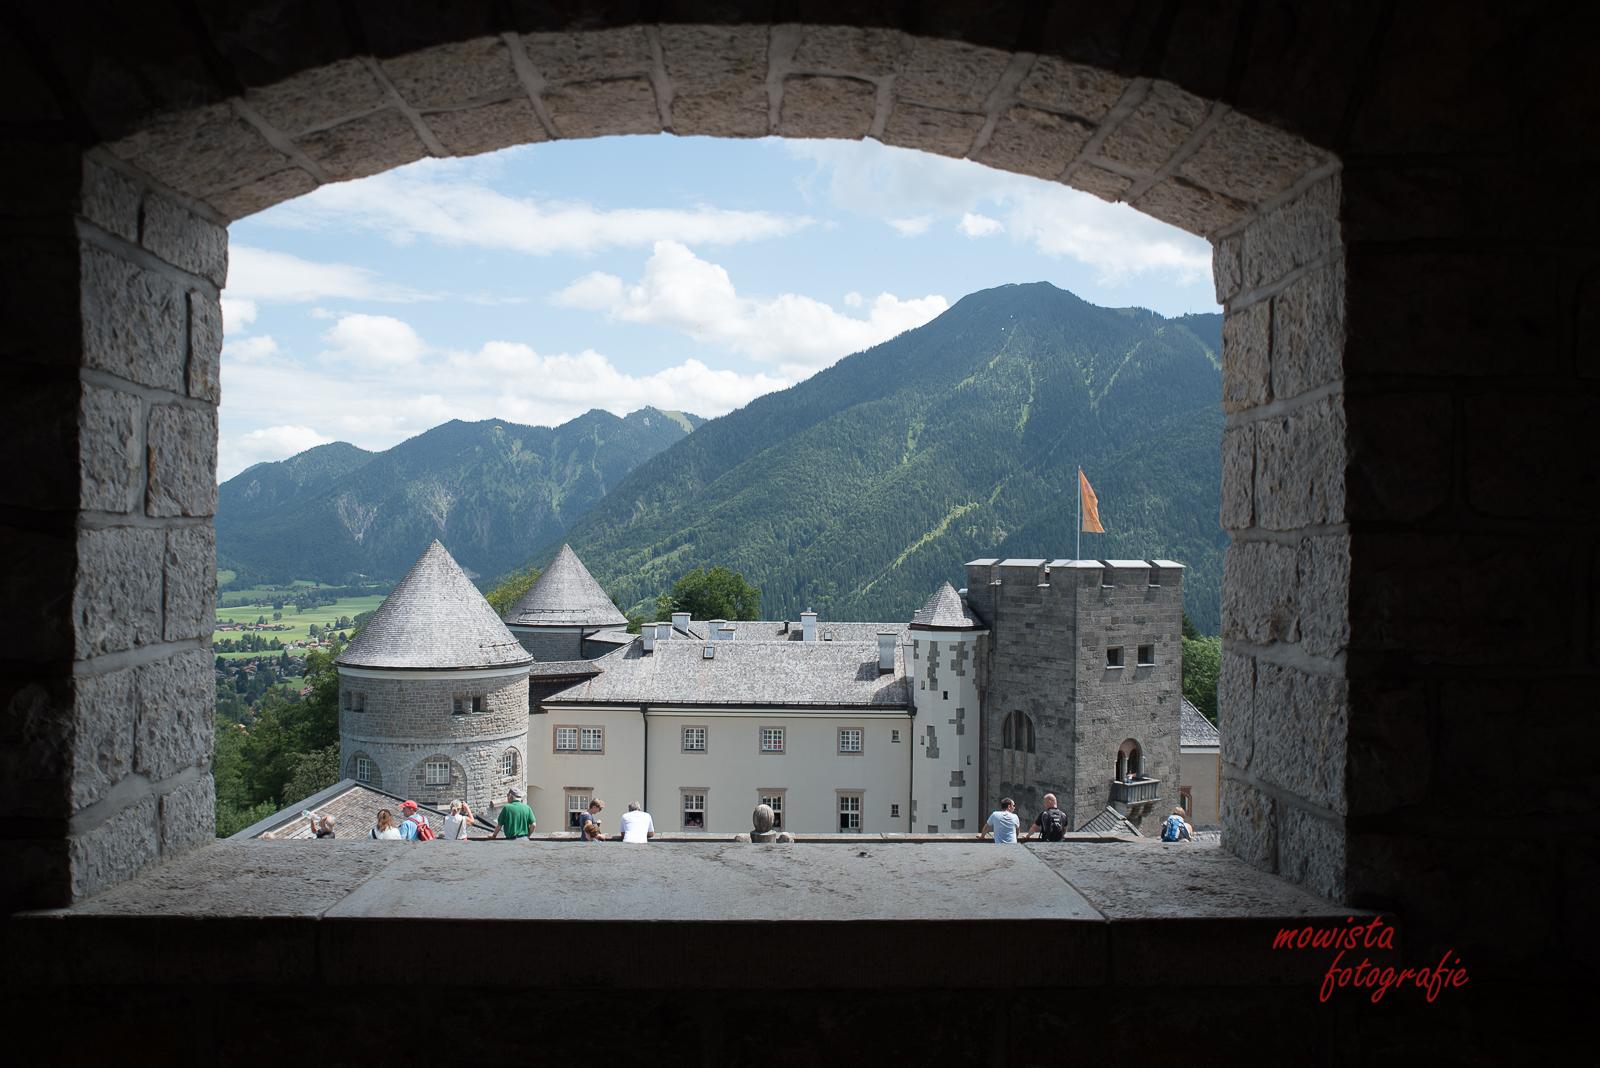 20170722_MW_DSC_5671_Schloss Ringberg